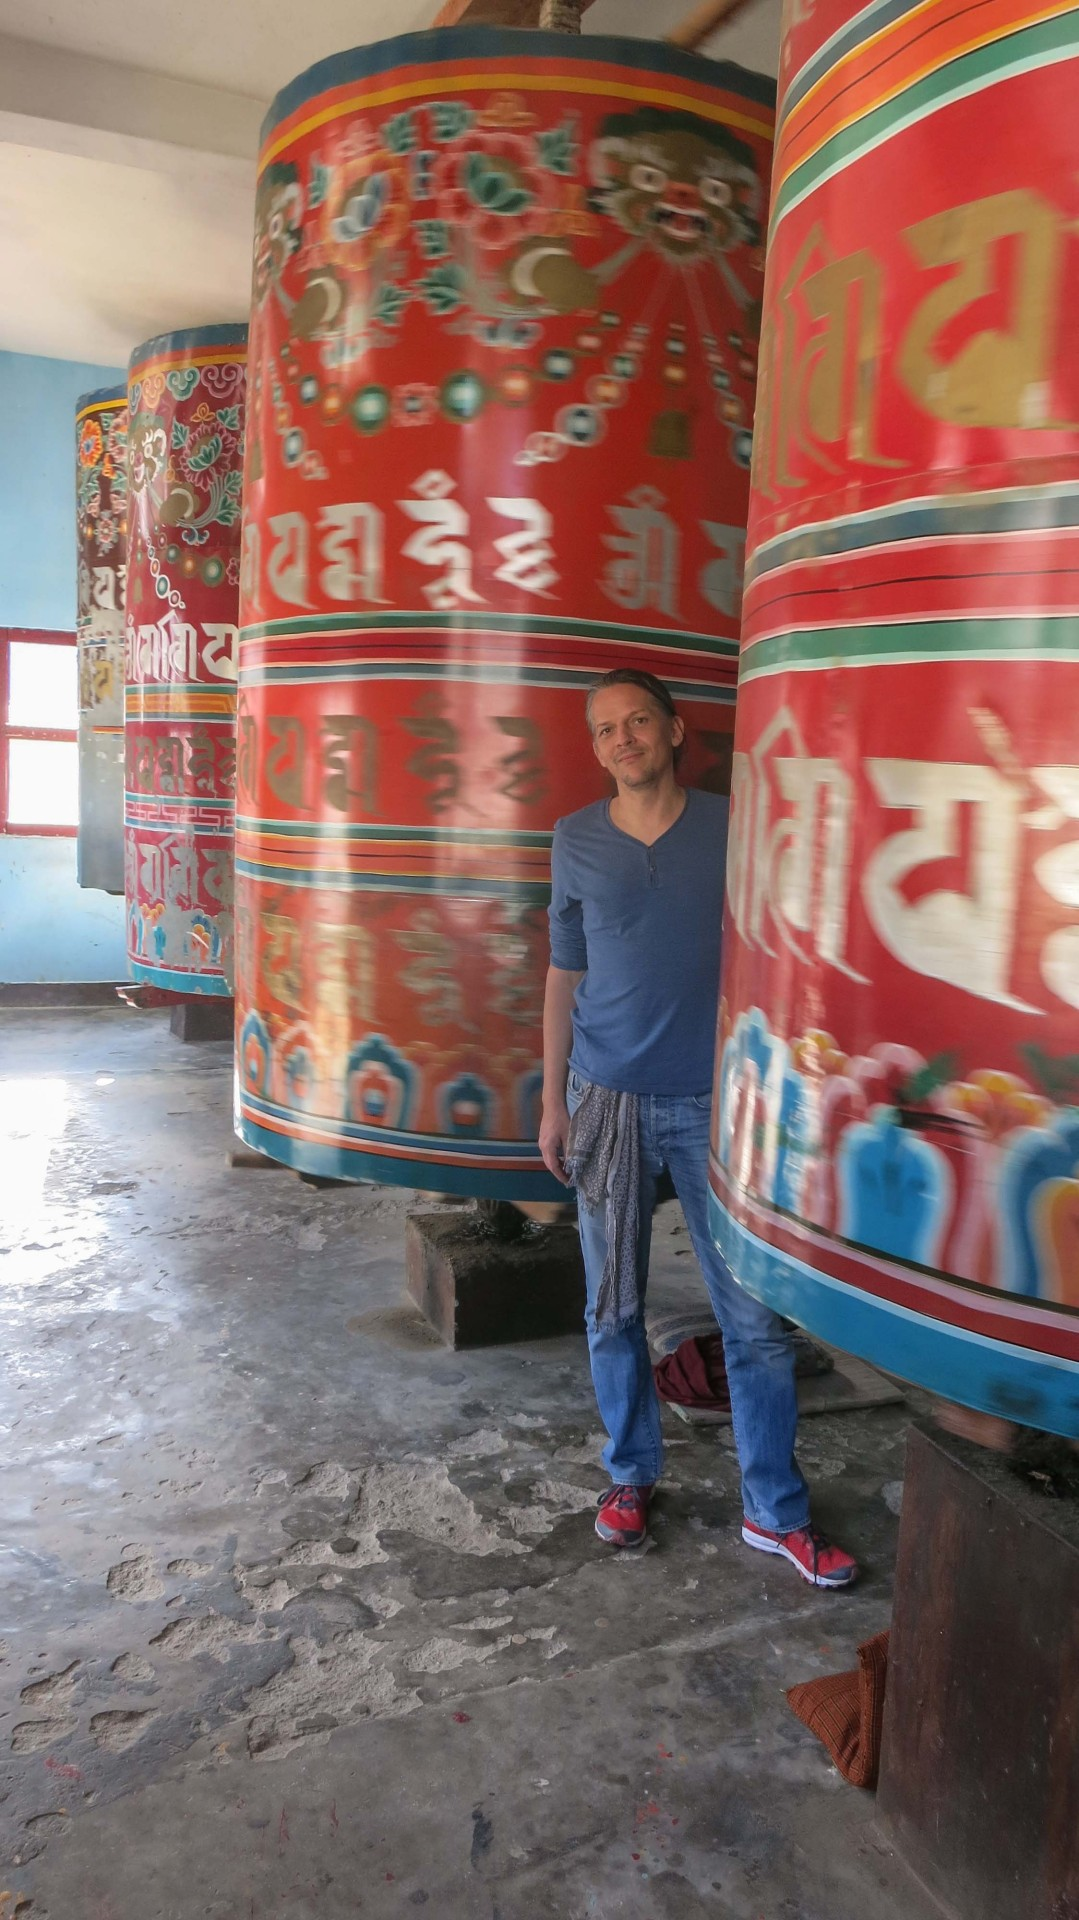 Prayerwheels in Ranjun